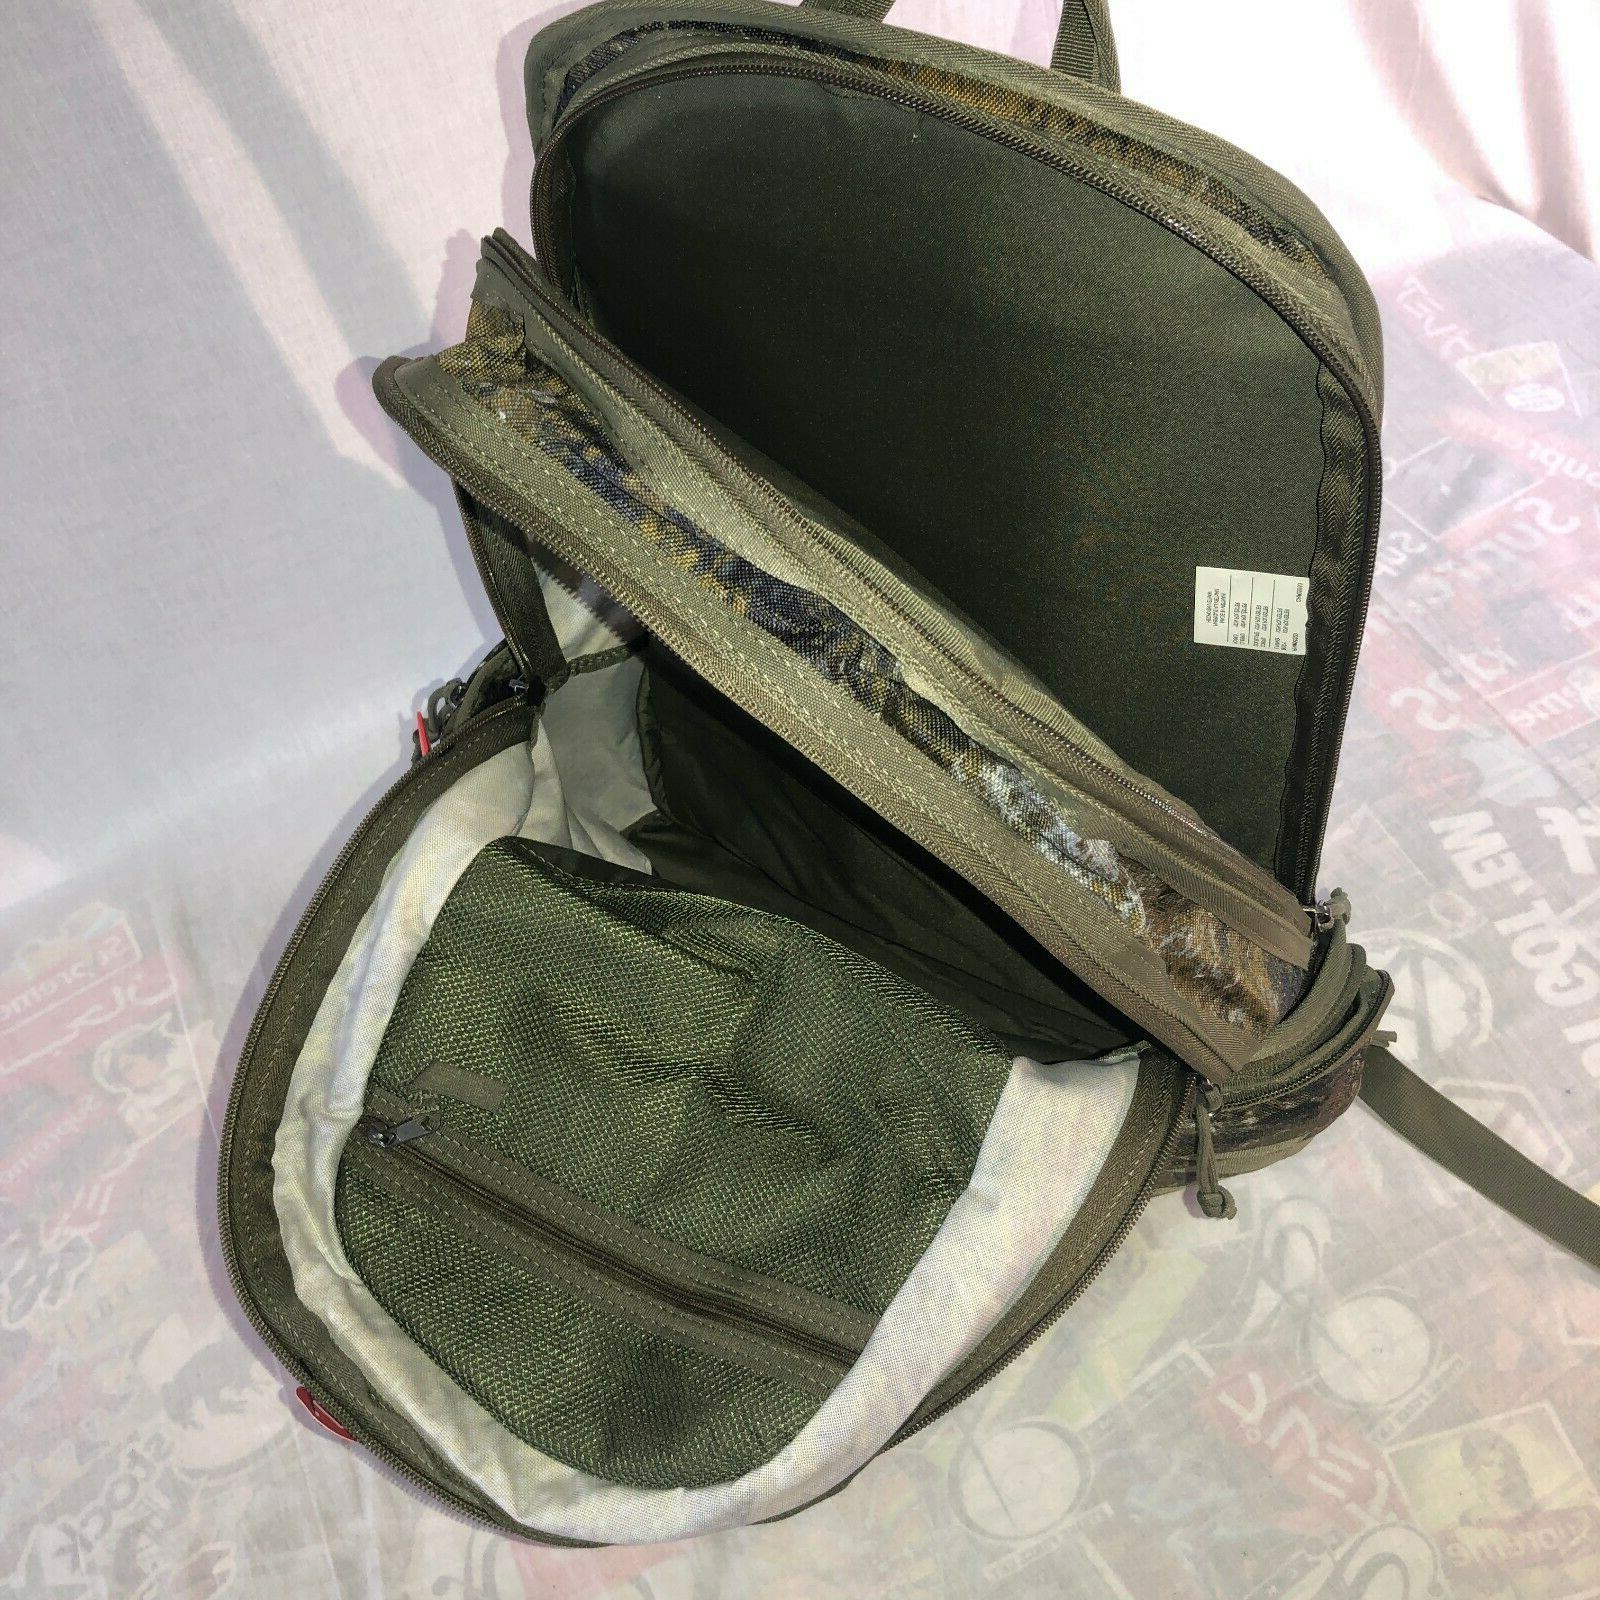 NWT RPM Camo Skateboard Laptop Bag $90